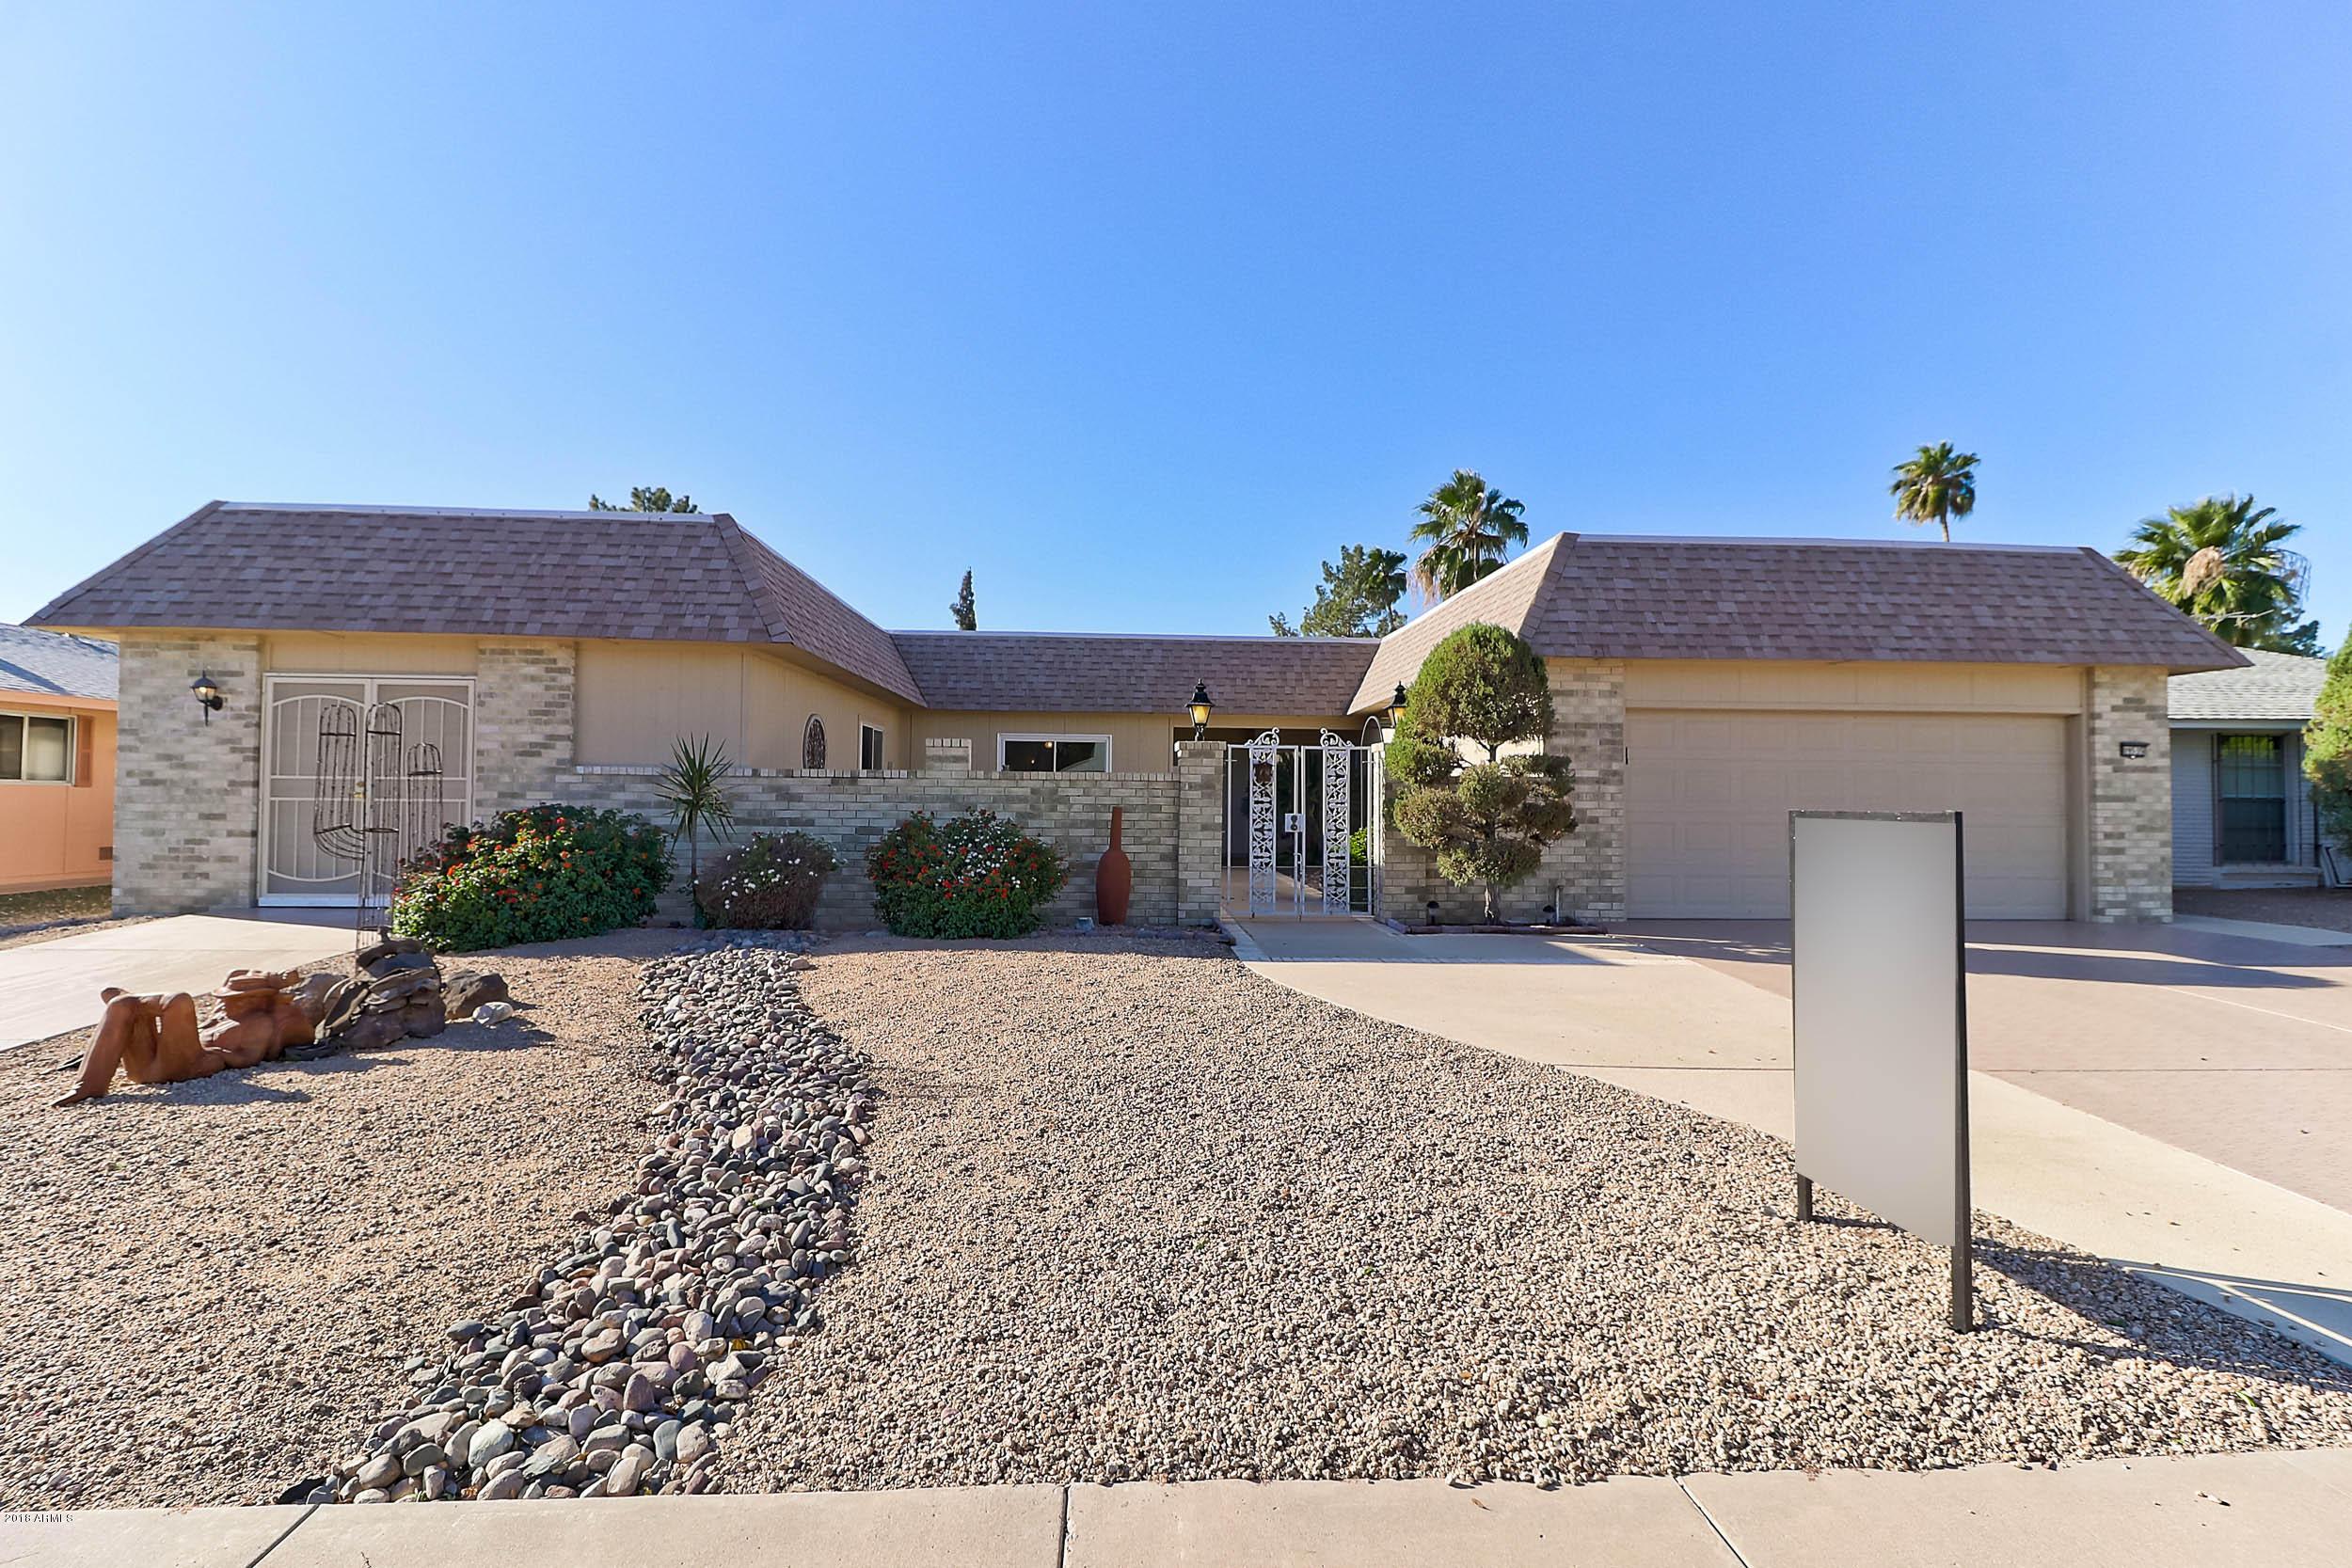 MLS 6086161 Sun City Metro Area, Sun City, AZ 85373 Sun City Homes for Rent